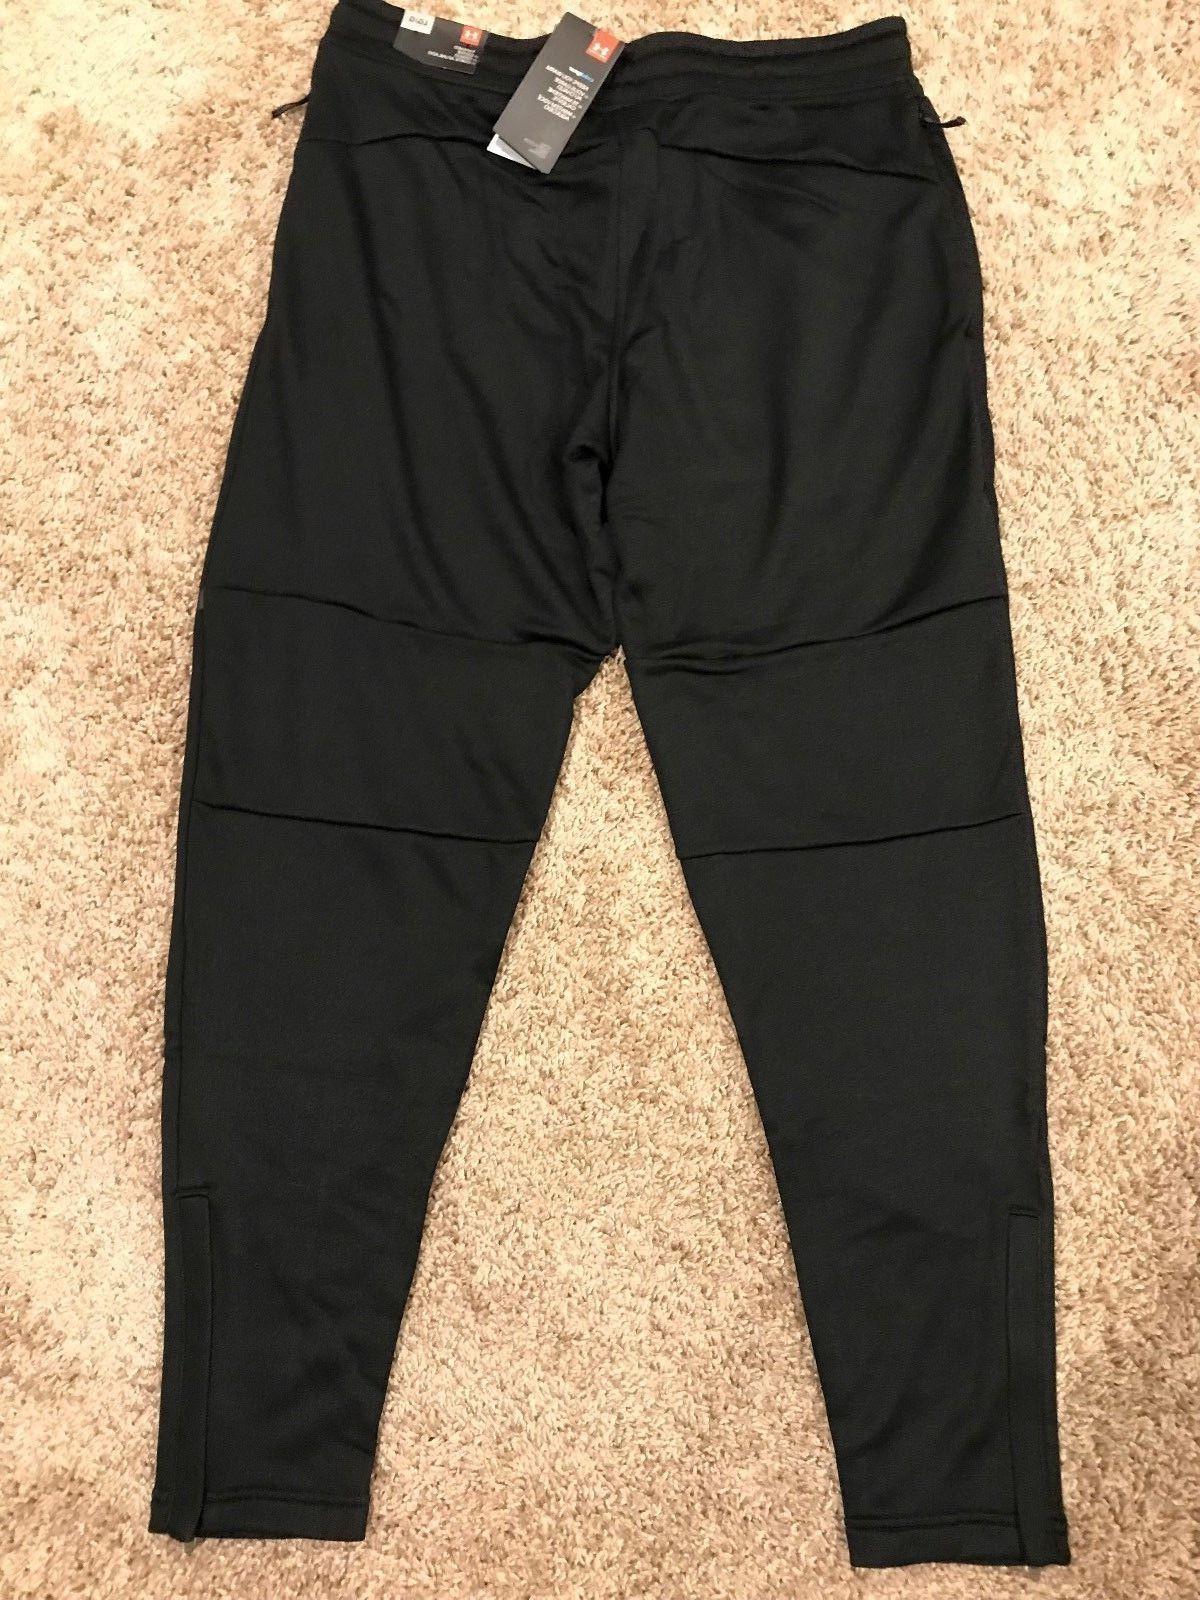 UNDER MK1 BLACK SWEAT PANT MANY SIZE